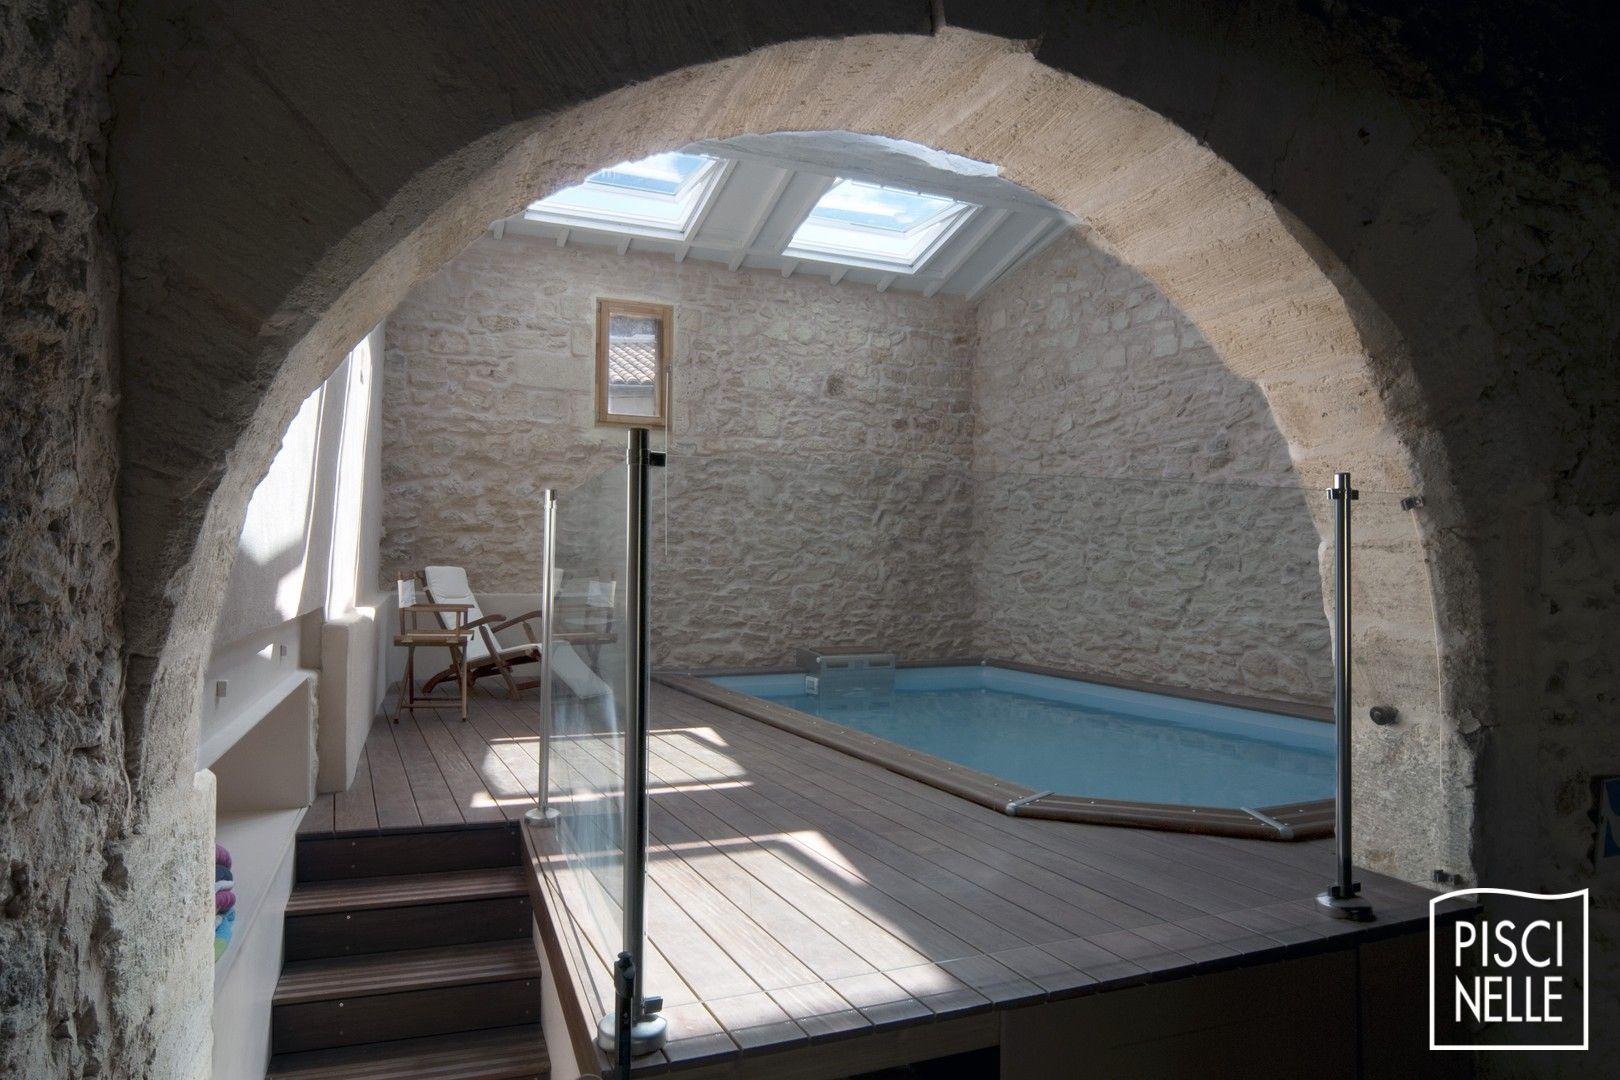 Voir Piscine Hors Sol piscine hors-sol - piscinelle